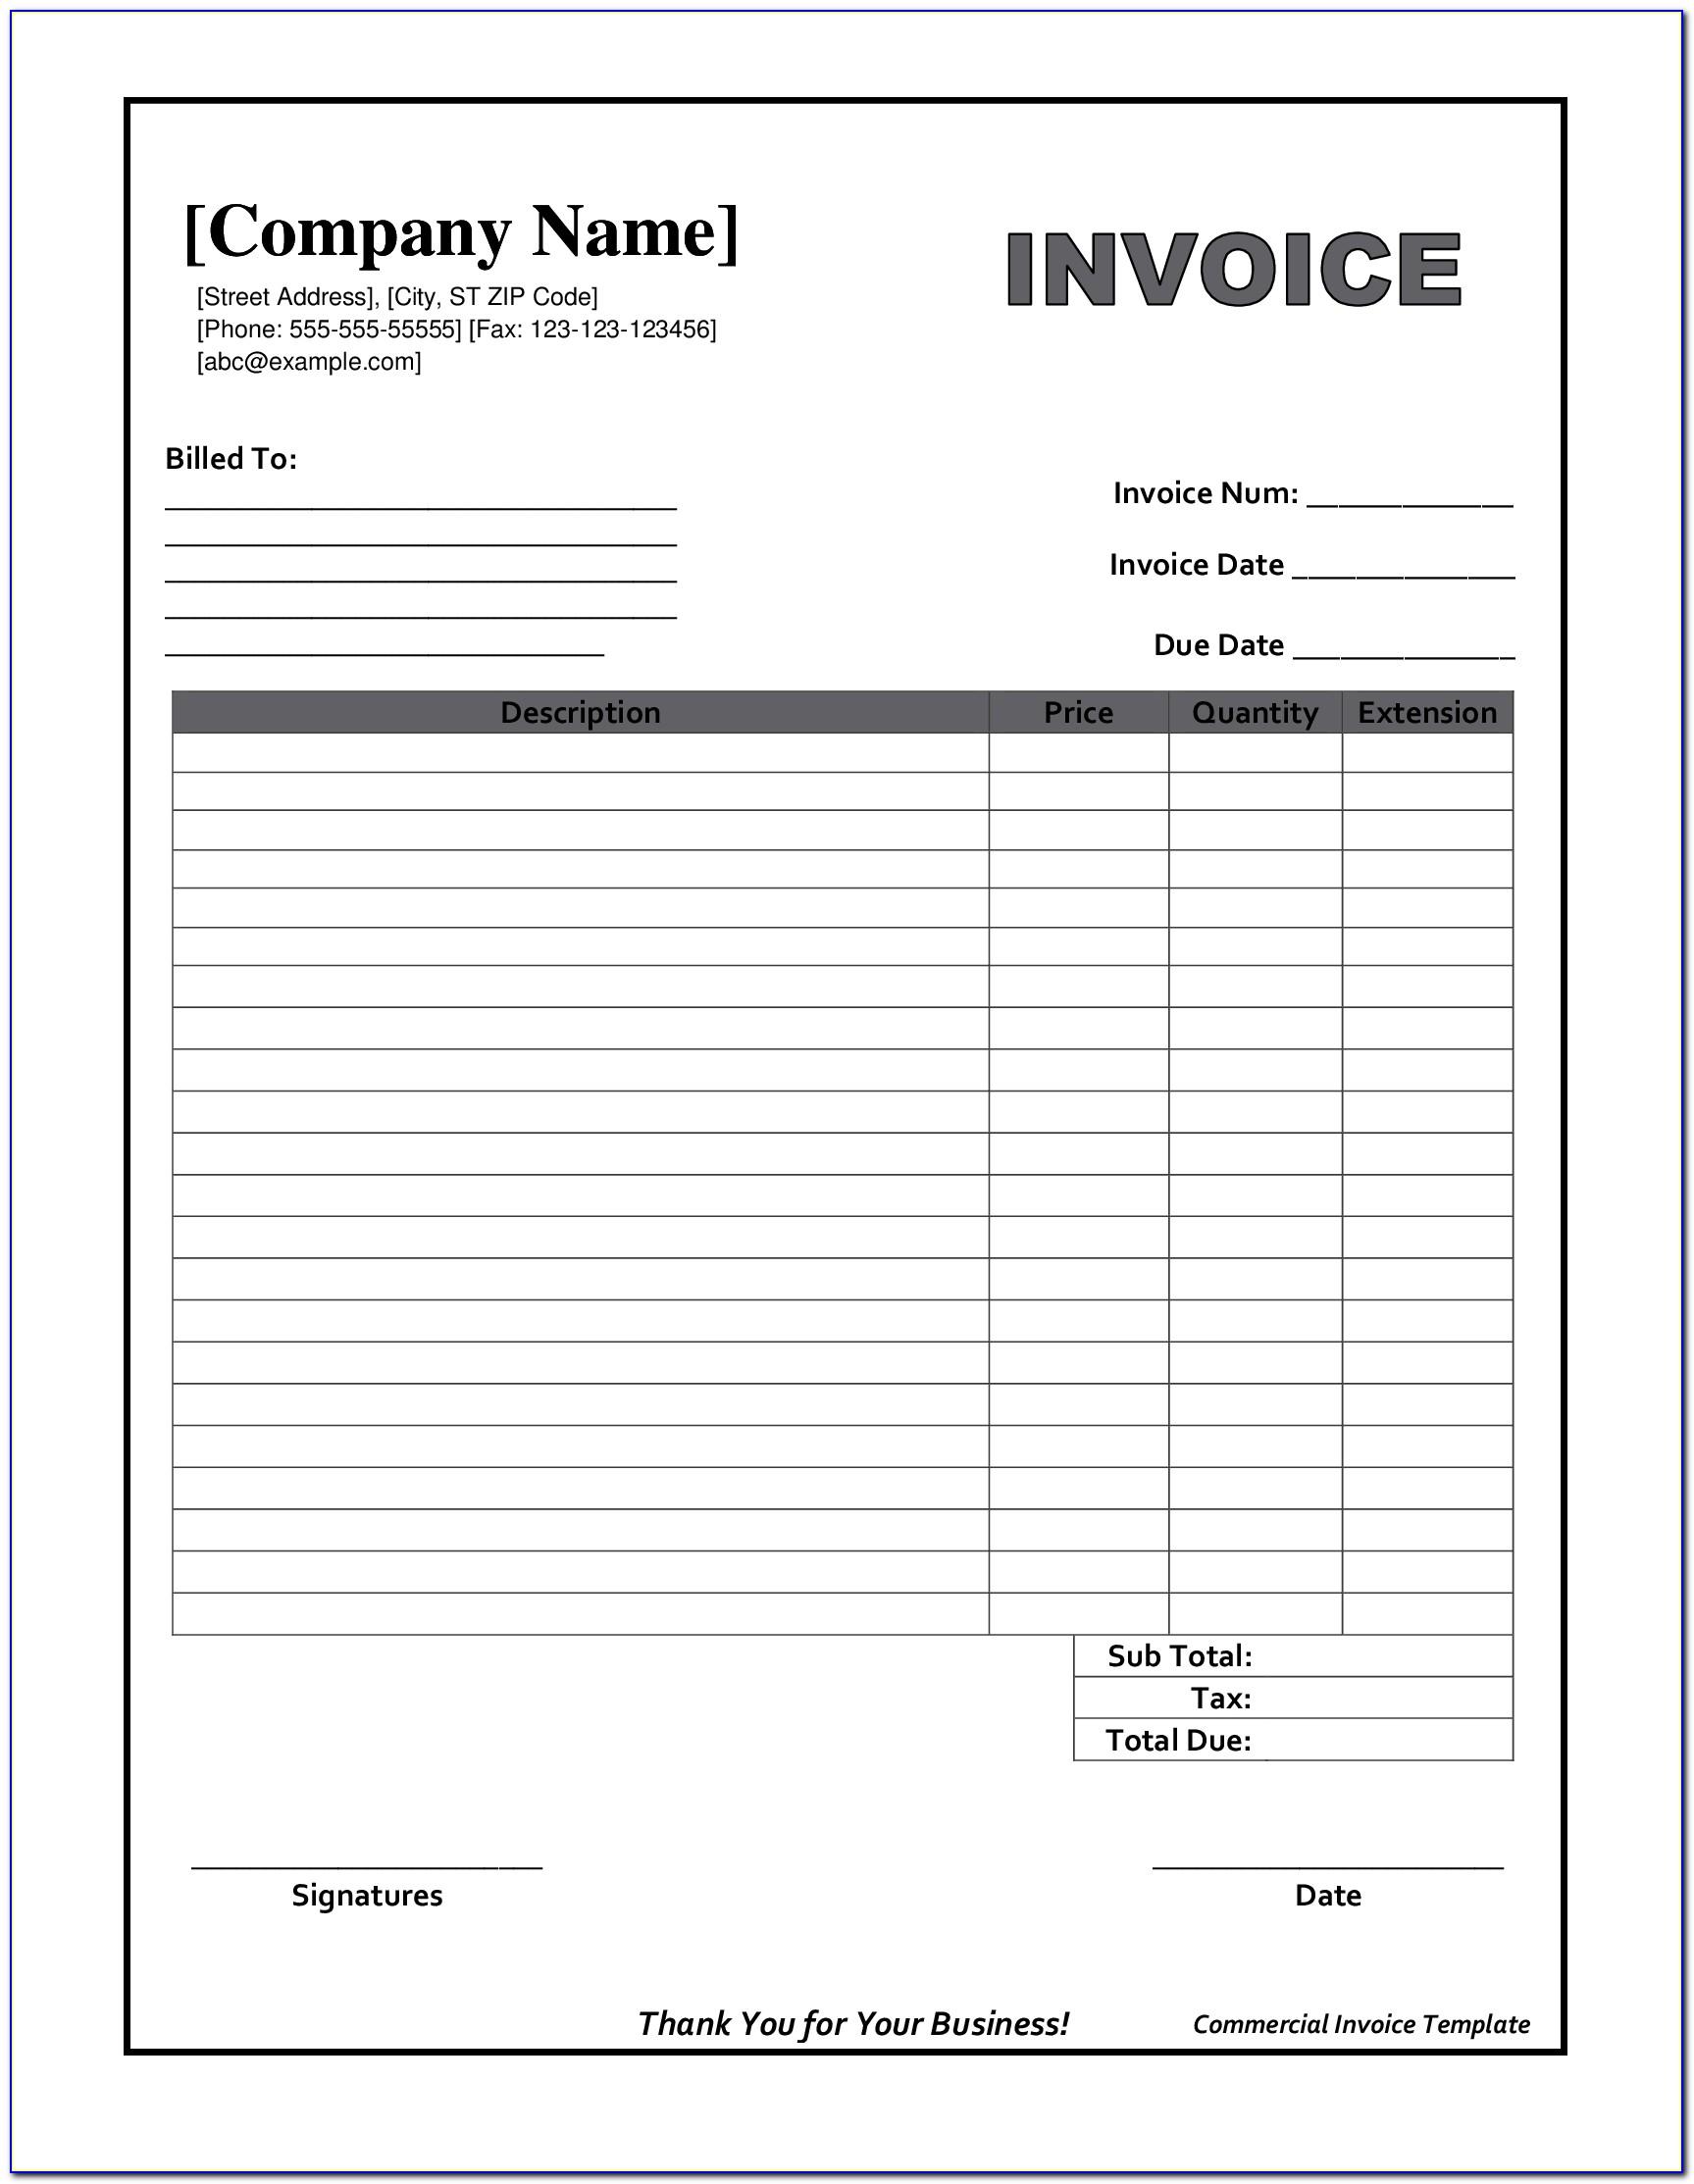 Blank Invoice Templates Free